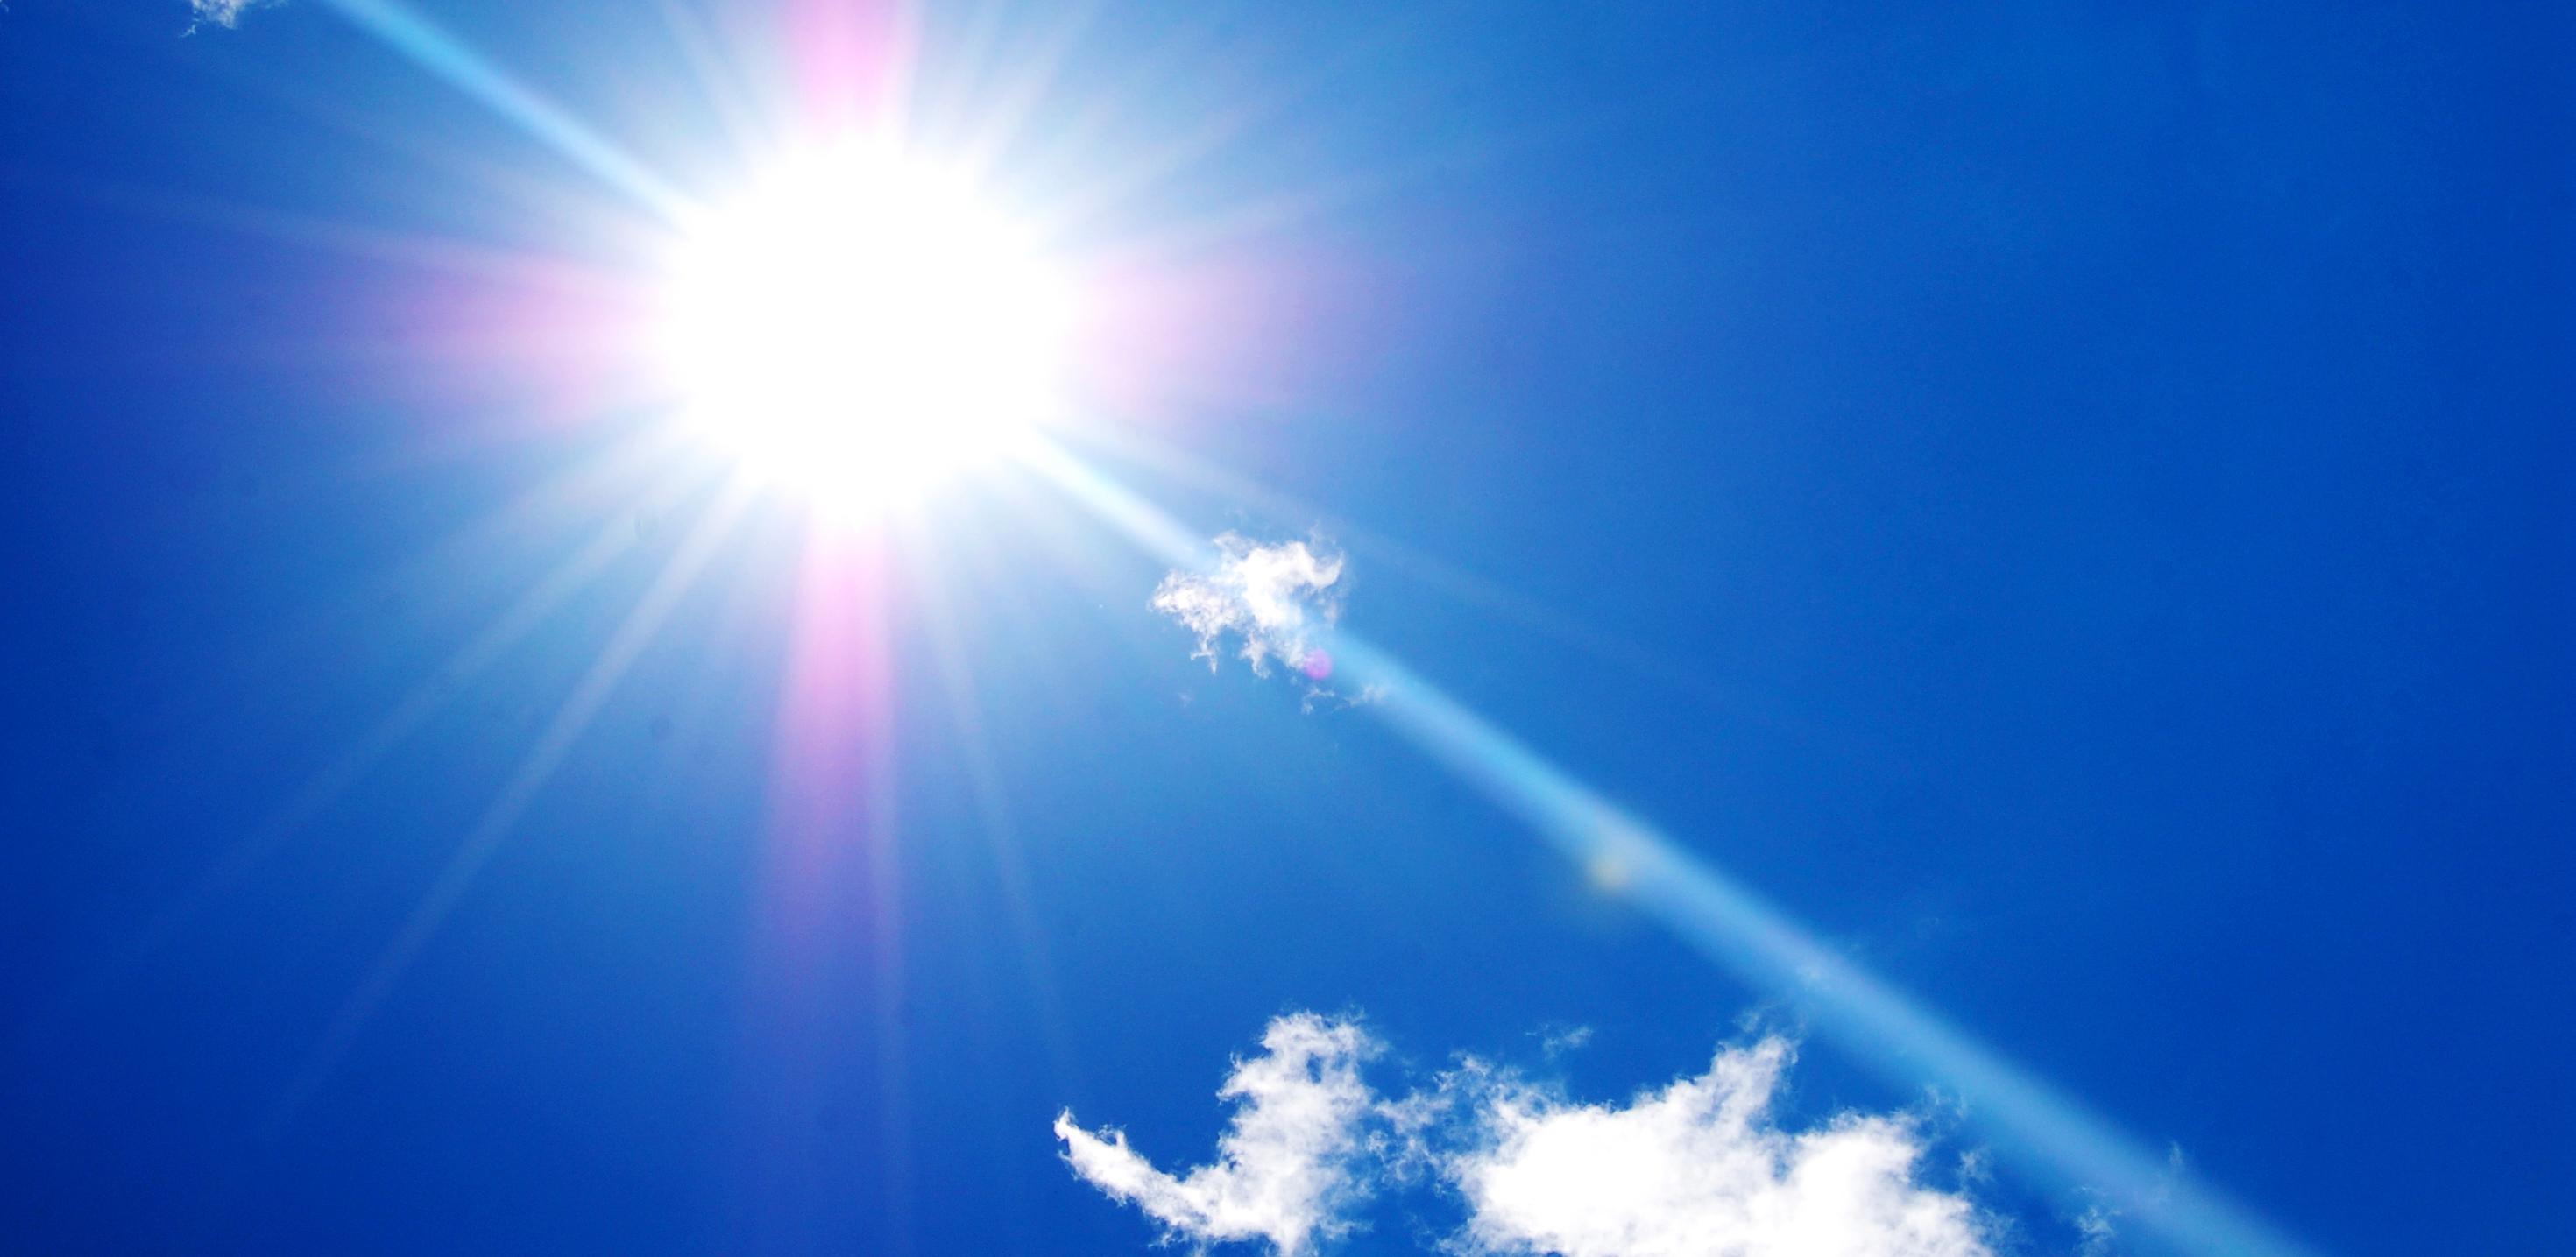 SUN PROTECTION FOR ASIAN SKIN